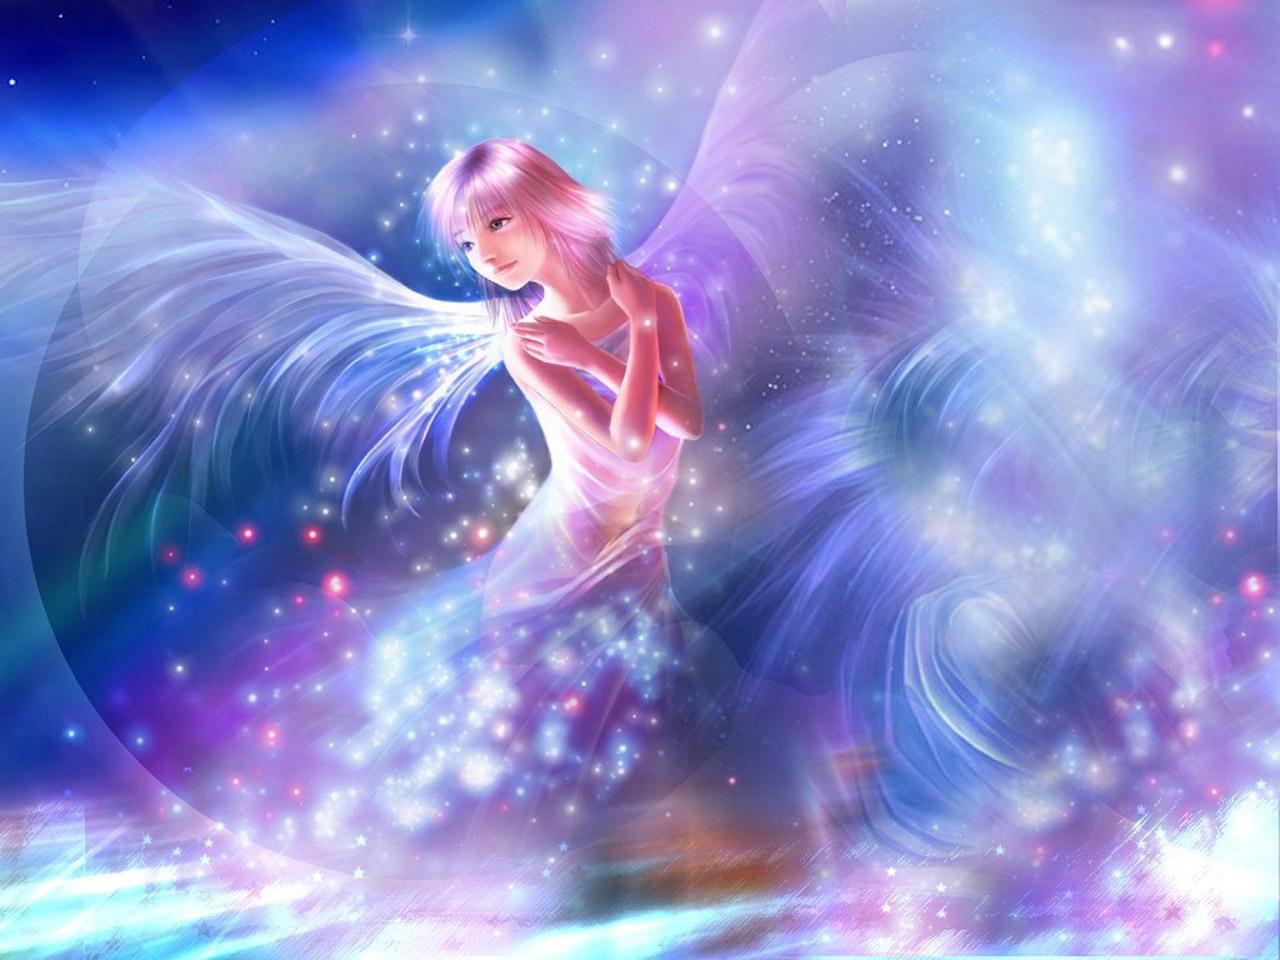 Shining Angel   Fantasy computer desktop wallpapers pictures 1280x960